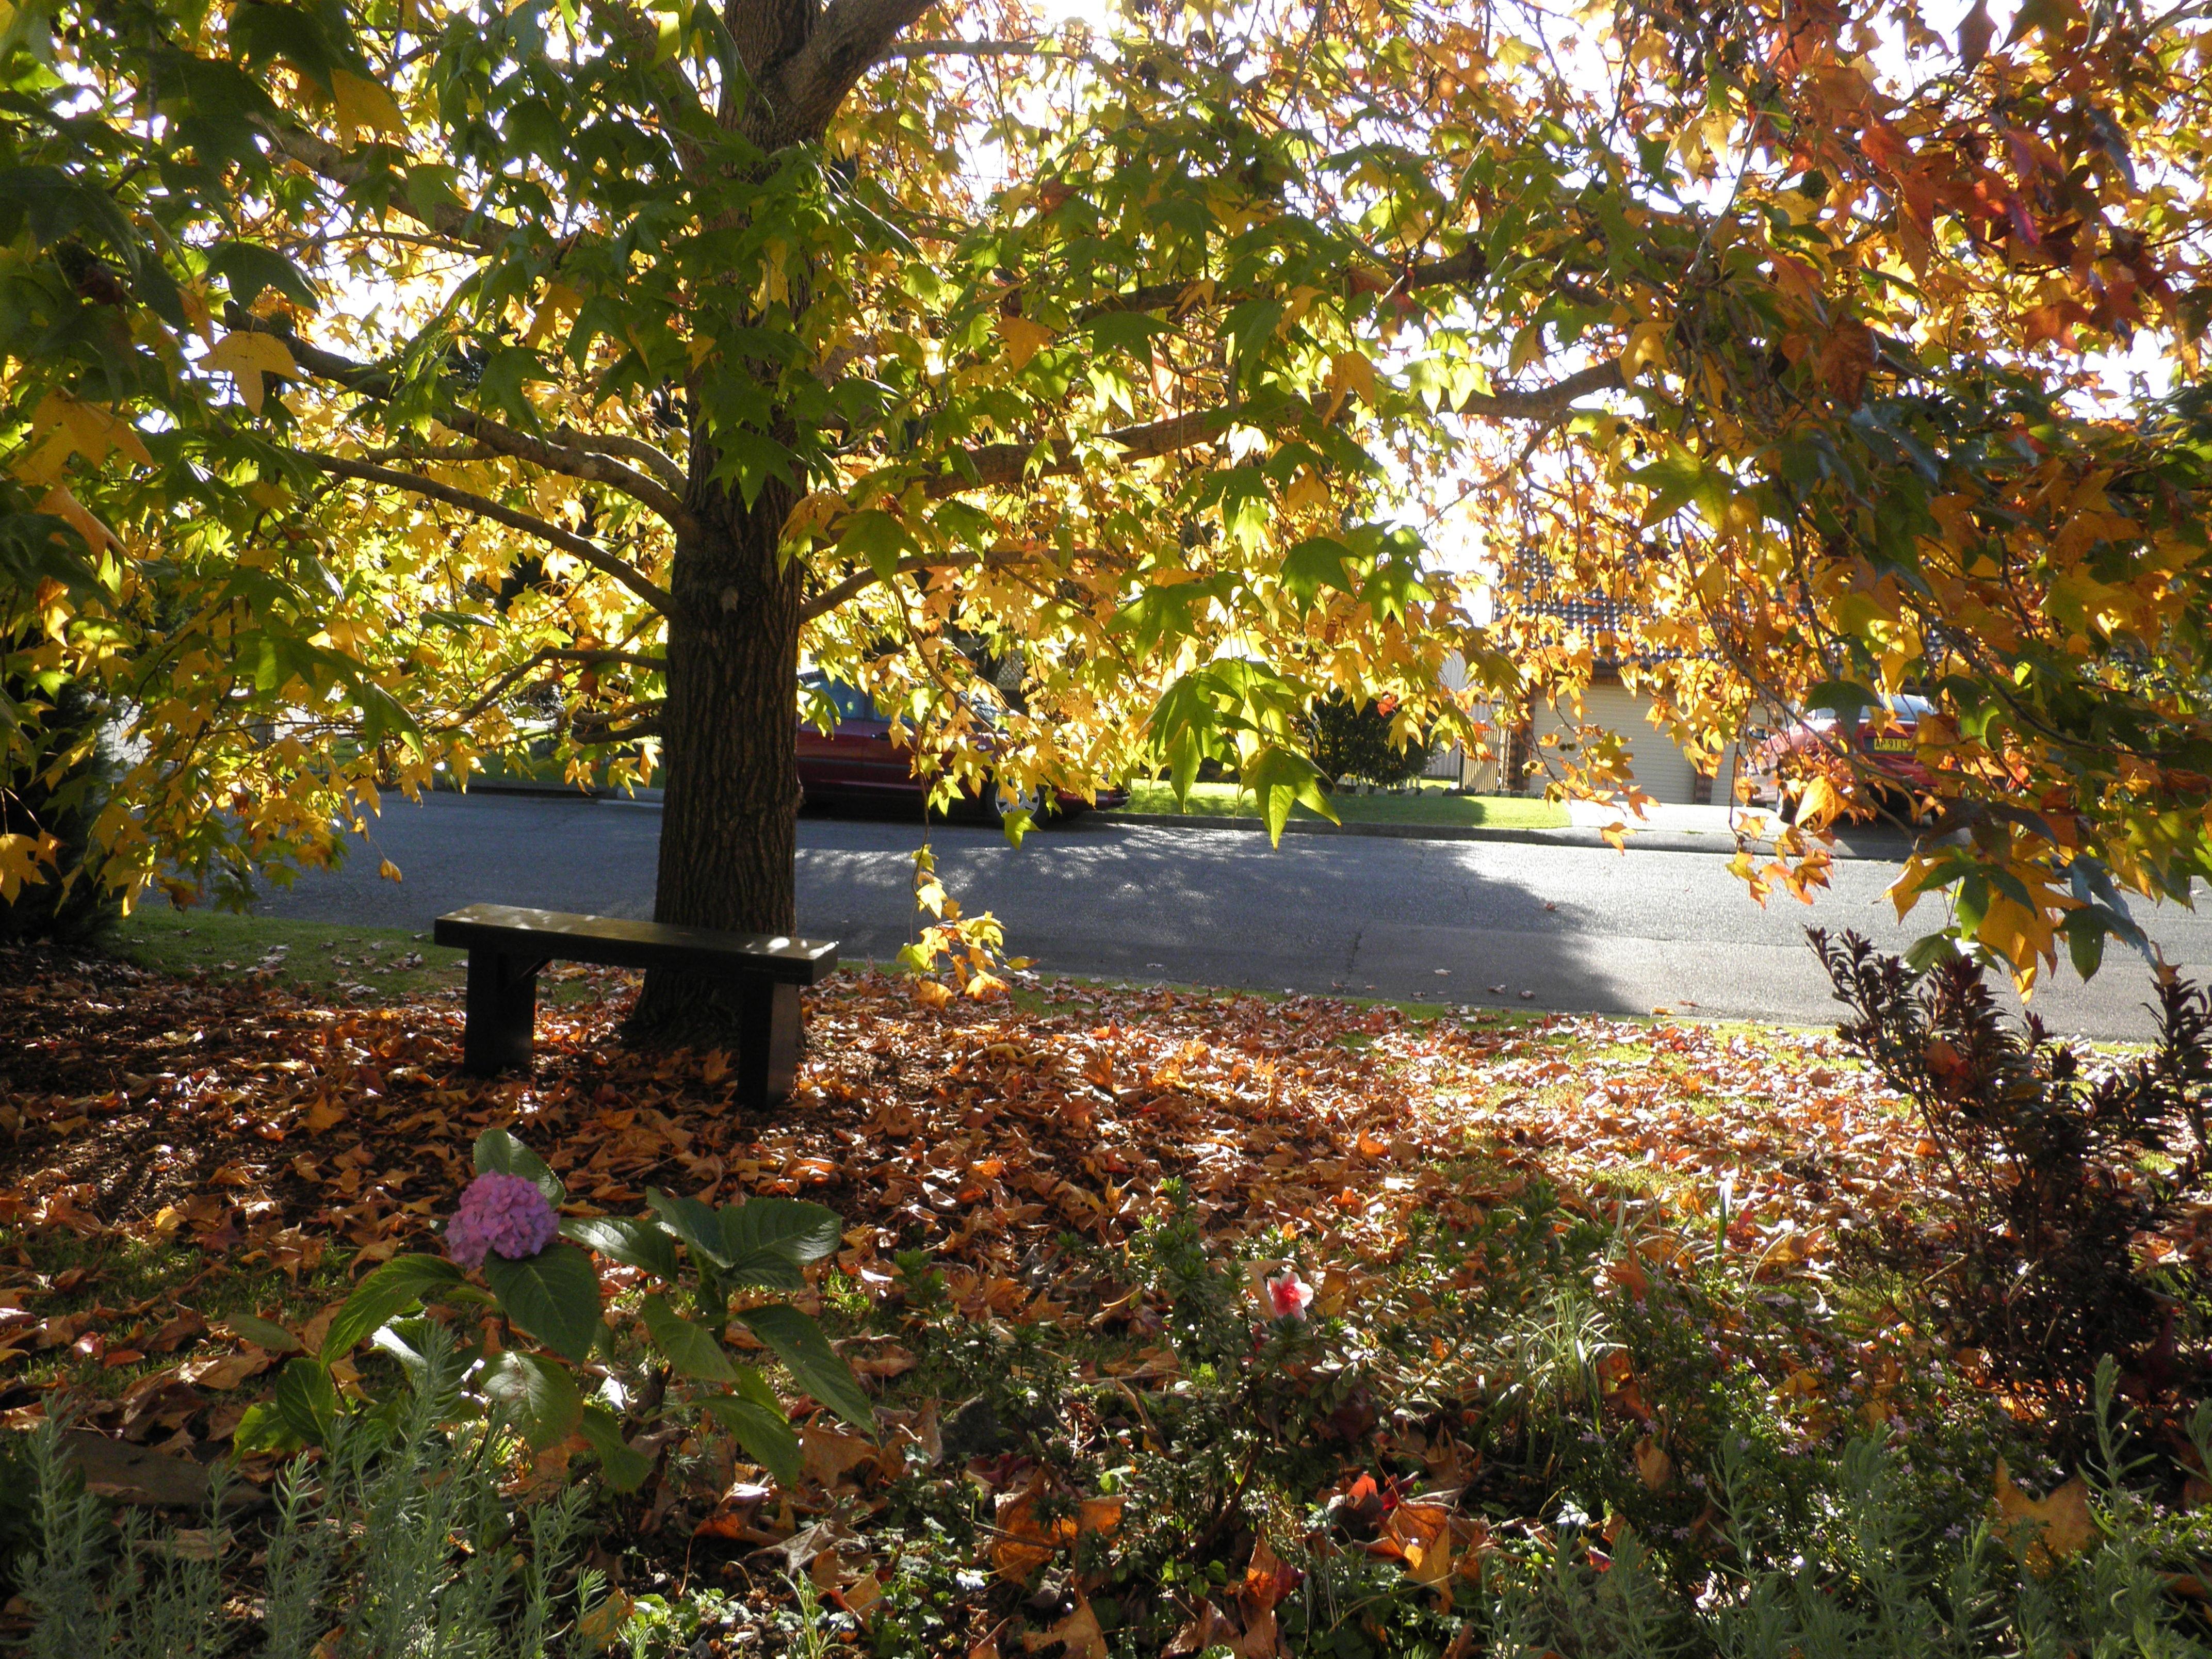 заявляют, картинки осень на дворе давно уже стала